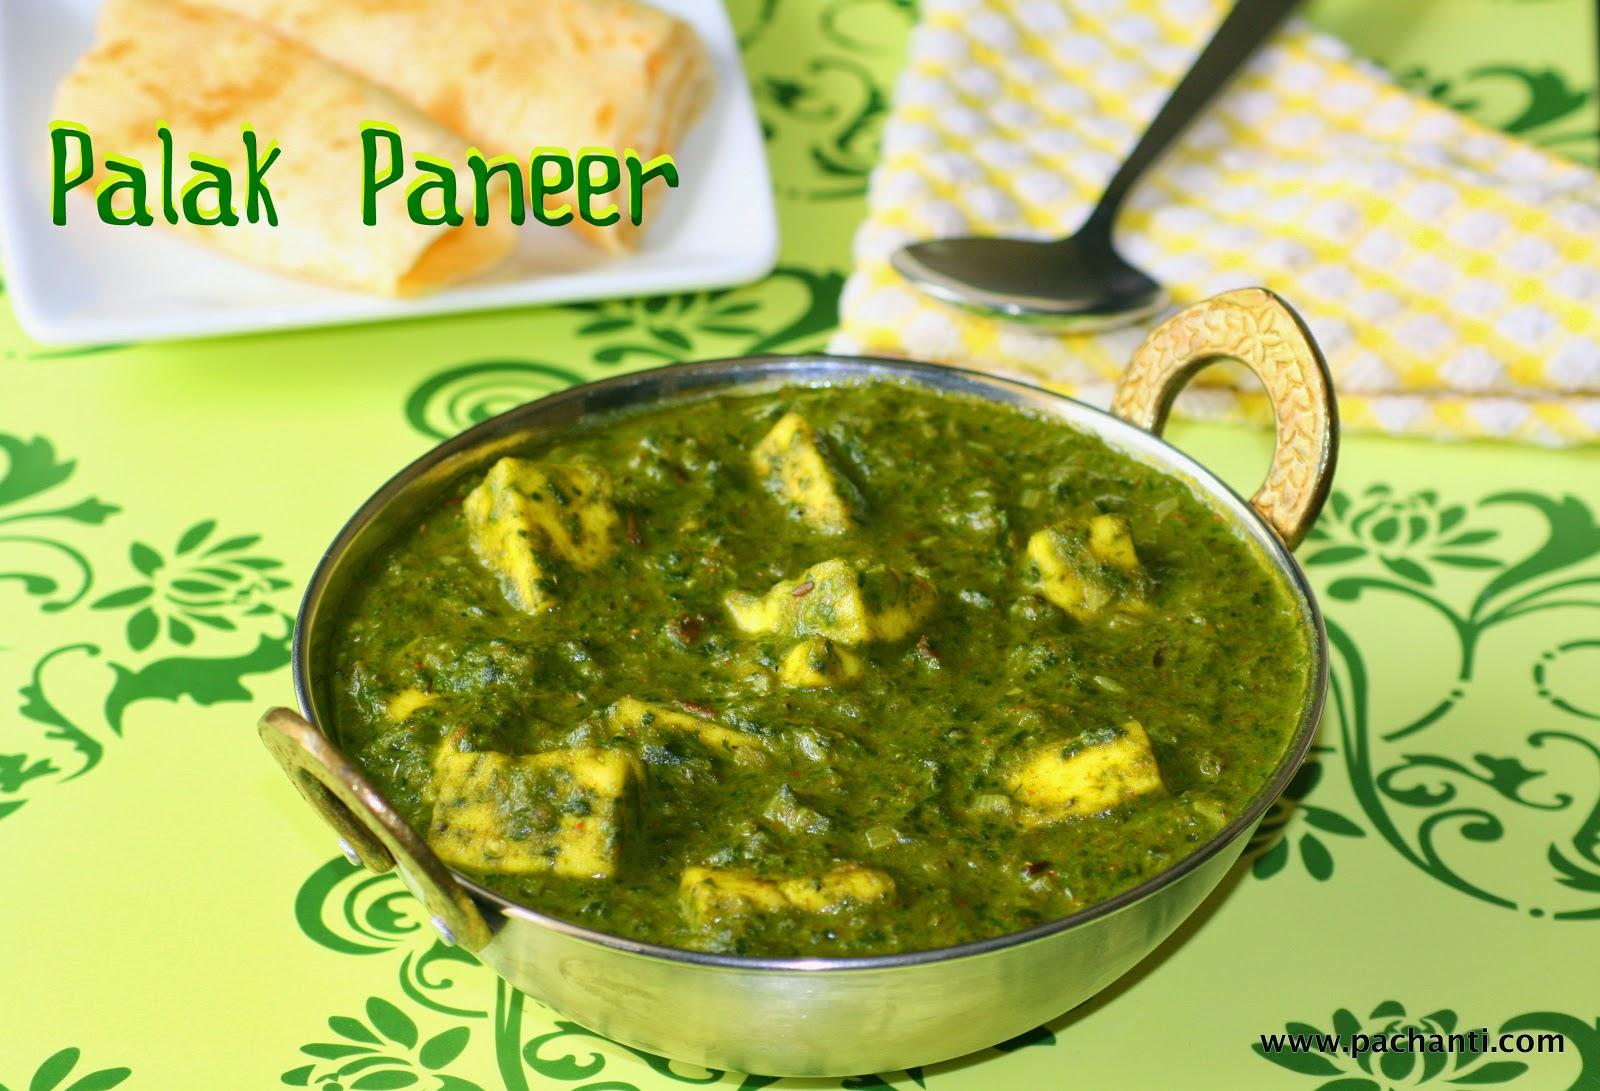 pachanti prepare food palak paneer paneer recipes pasala keerai paneer masala forumfinder Image collections